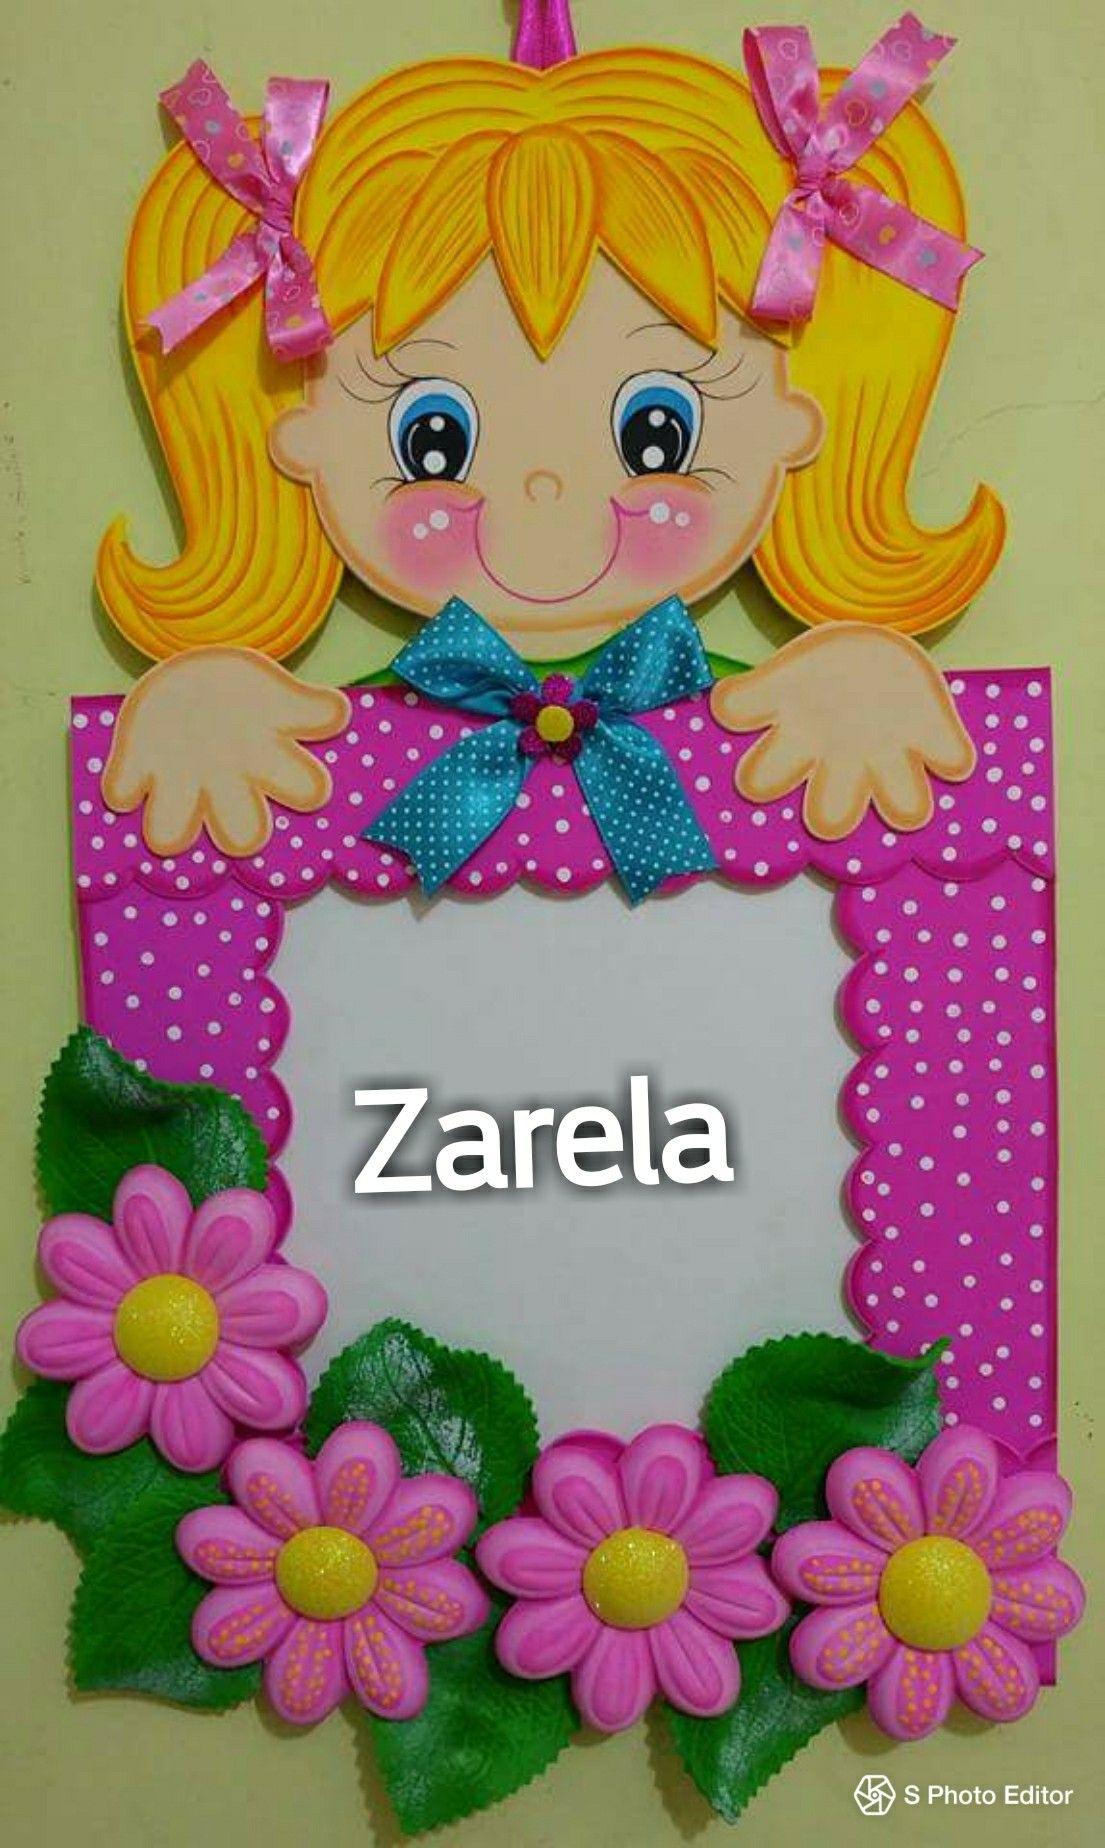 Pin de zarela temoche en foami pinterest goma eva gomitas y fomy - Figuras para decorar ...